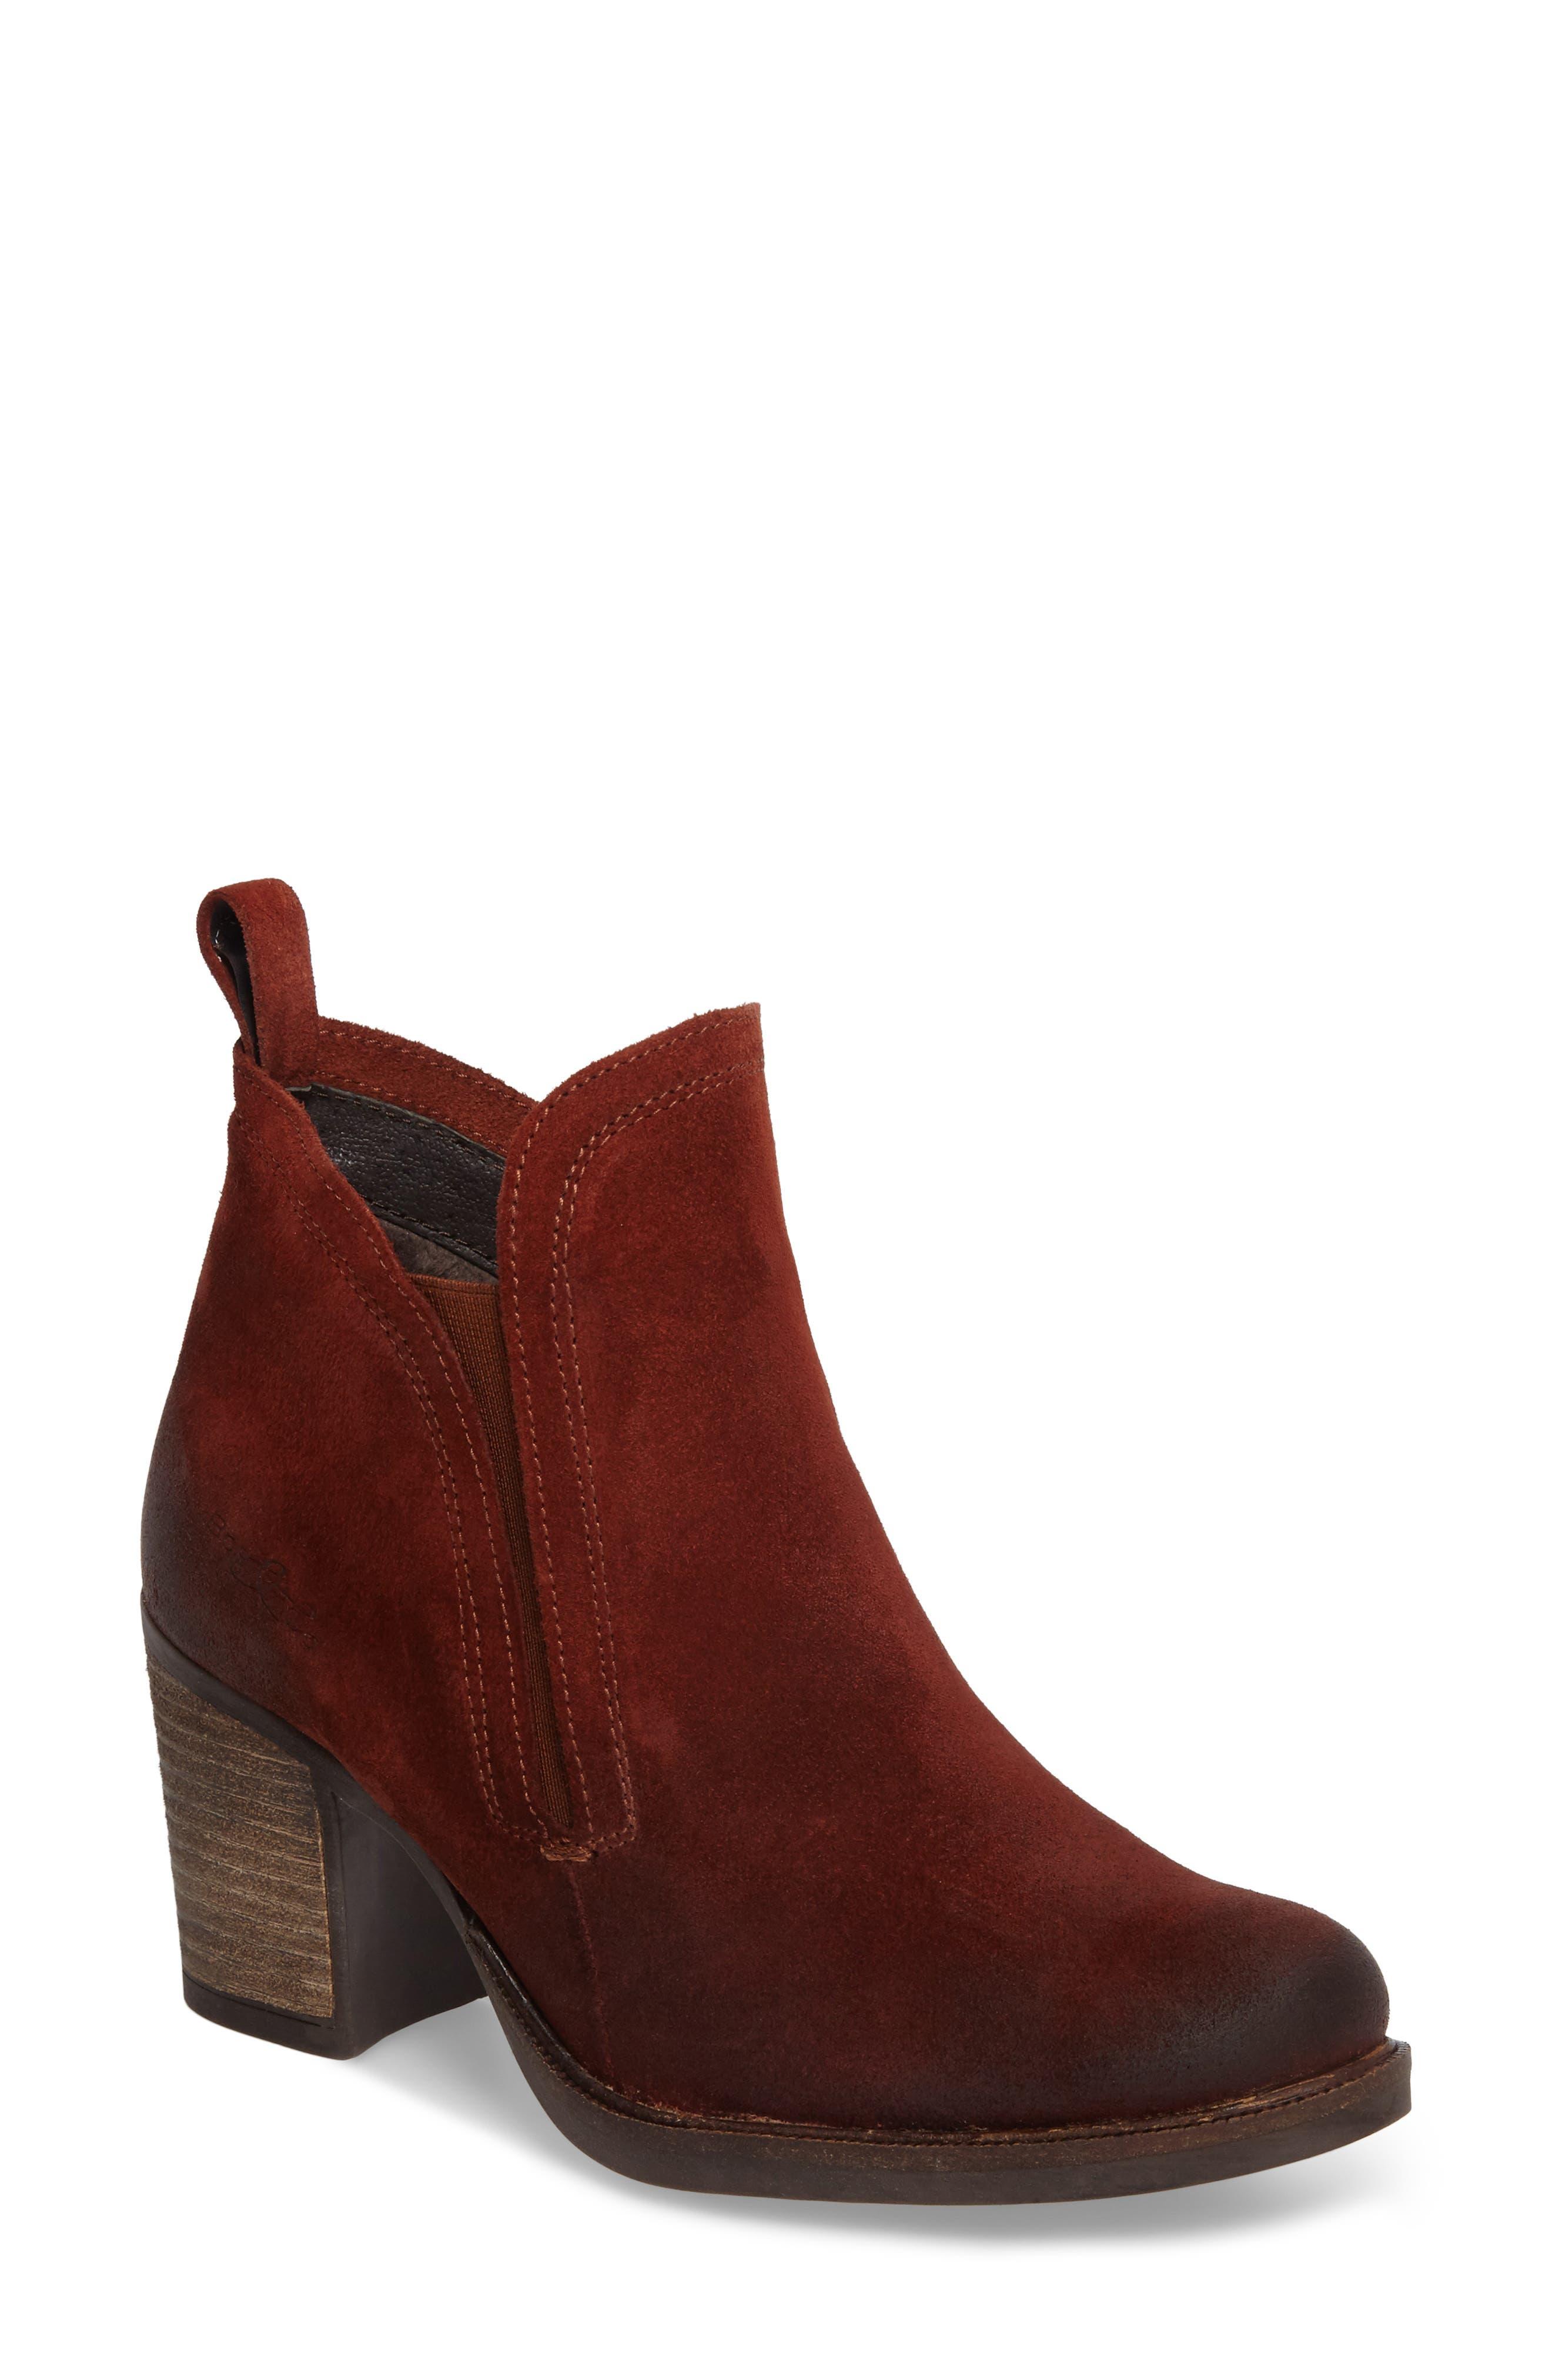 Alternate Image 1 Selected - Bos. & Co. 'Belfield' Waterproof Chelsea Boot (Women)